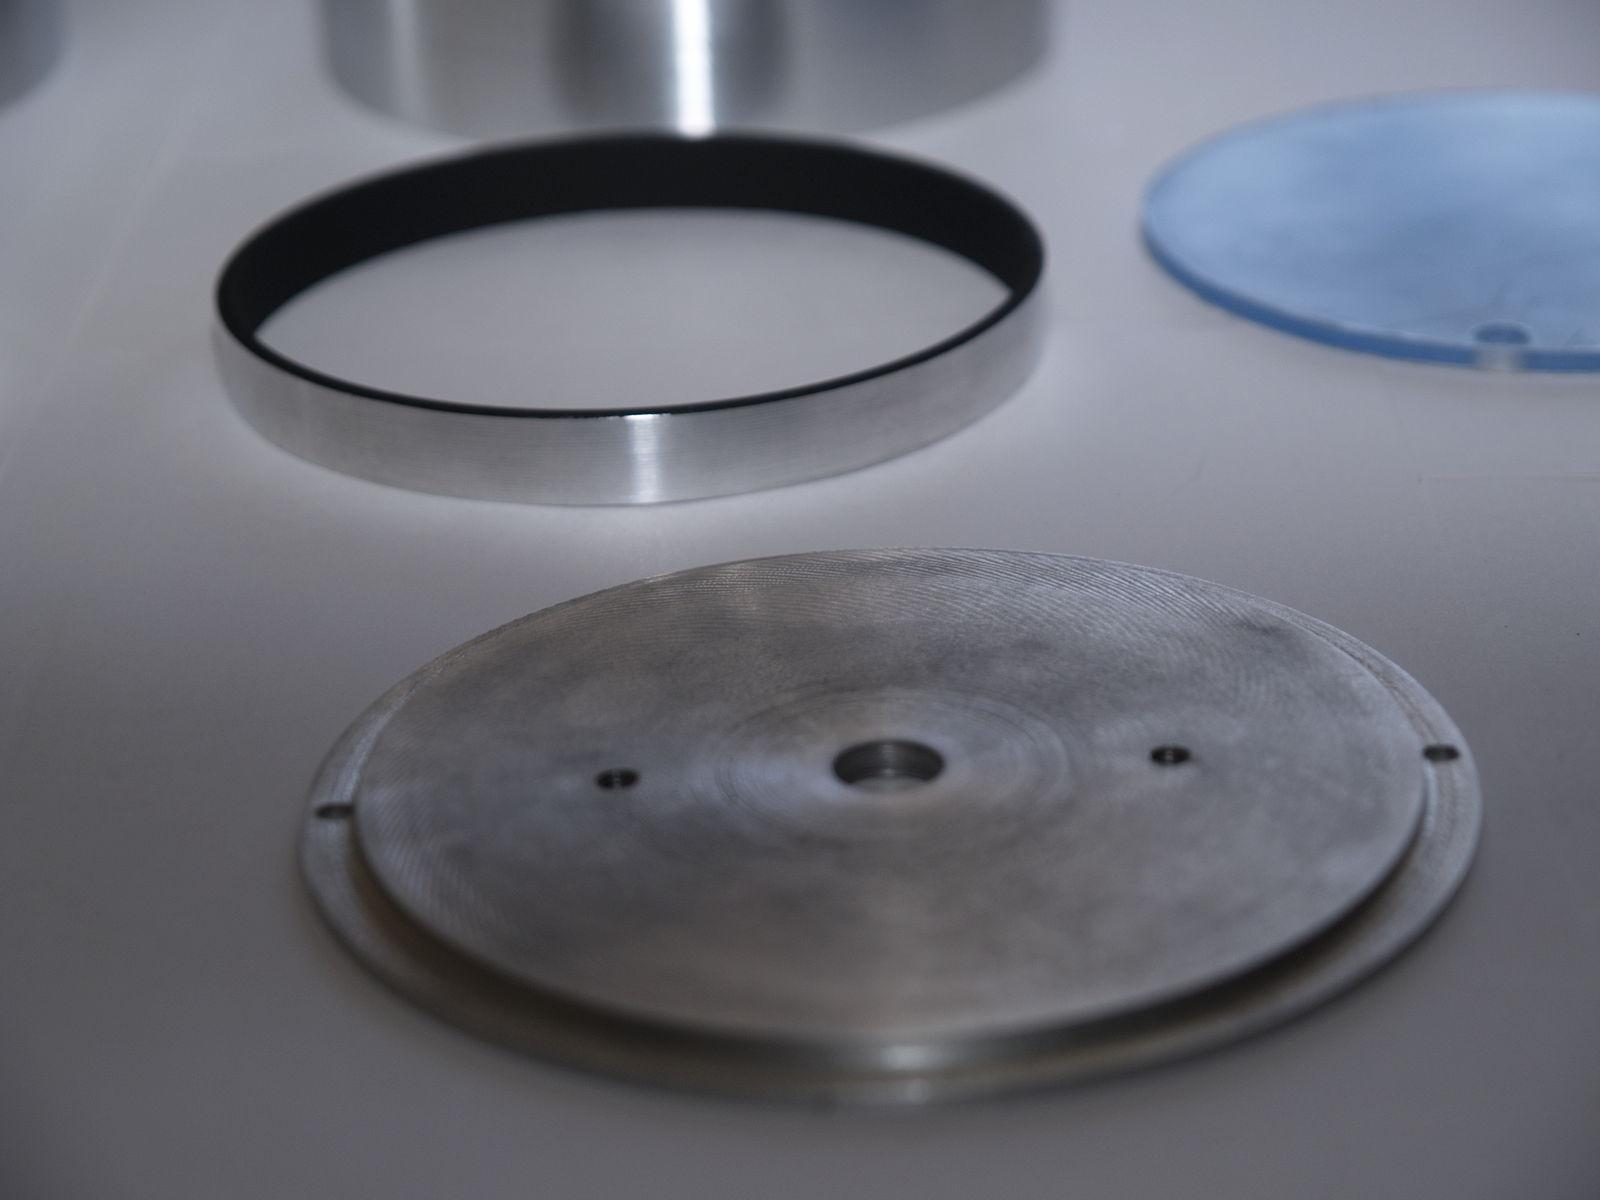 Детали корпусов приборов (тахометр и спидометр)